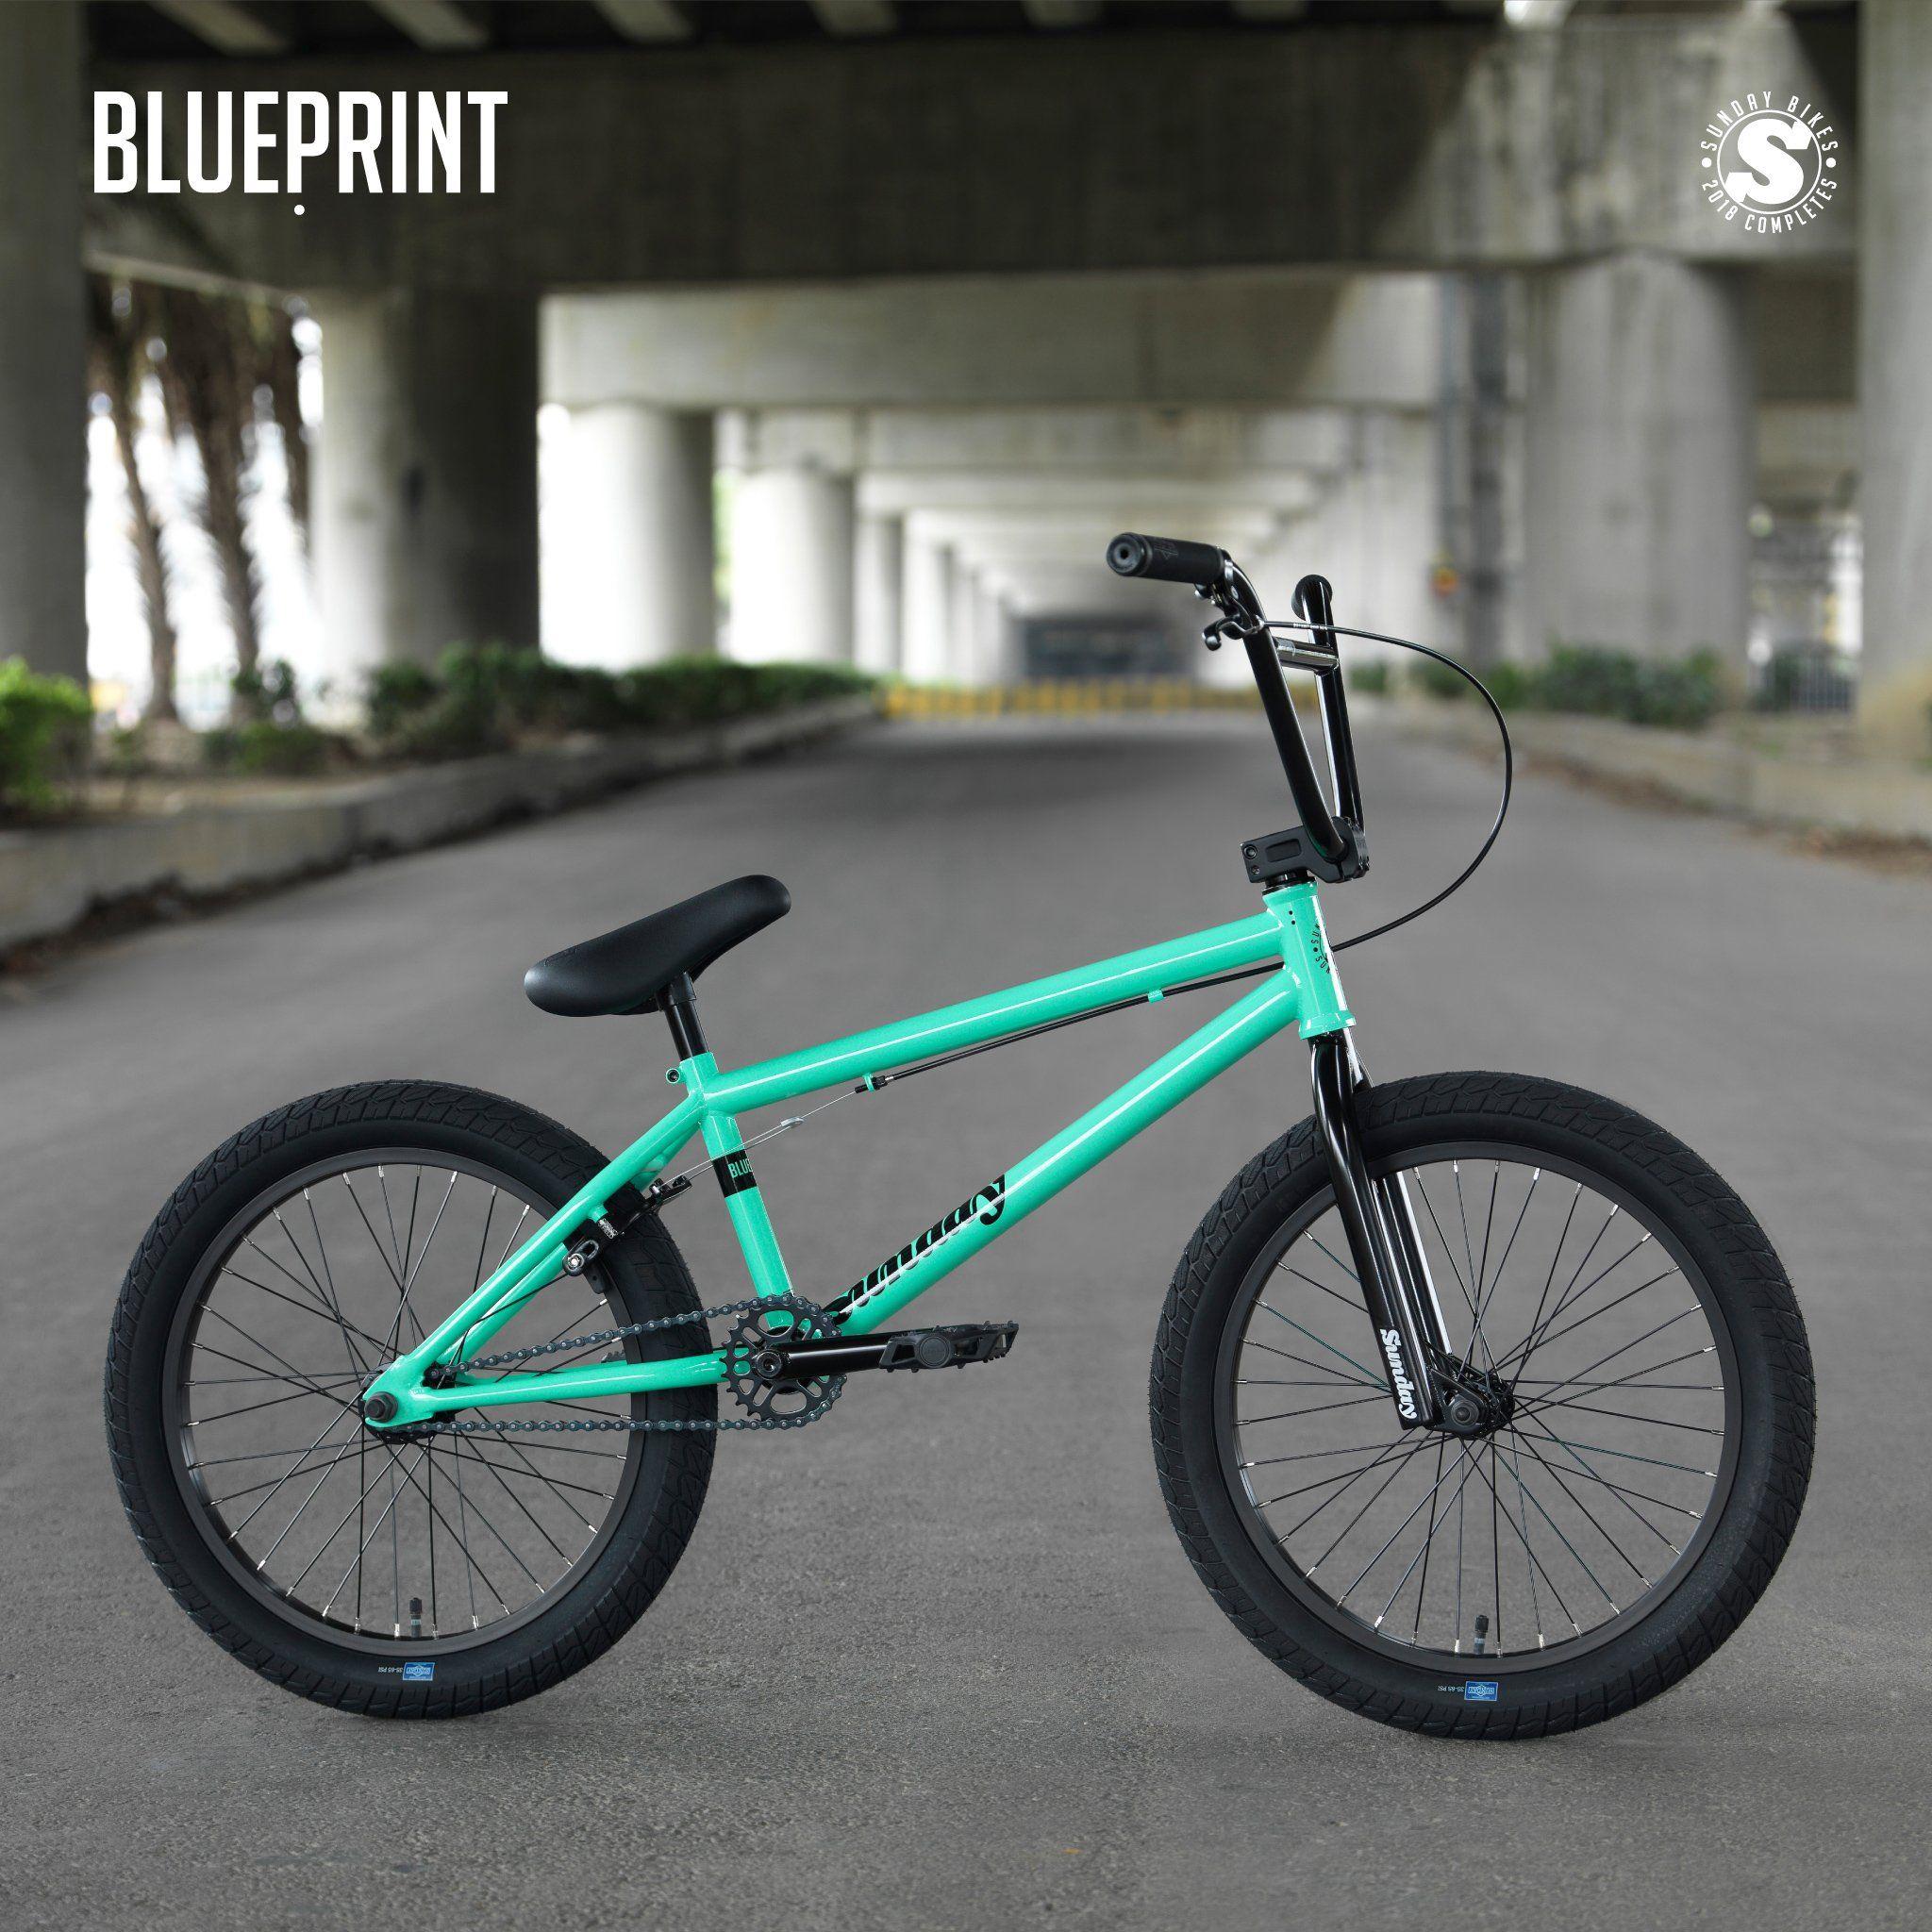 Sunday 2018 Blueprint 20 Complete Bmx Bike Bmx Bikes Sunday Bmx Bmx